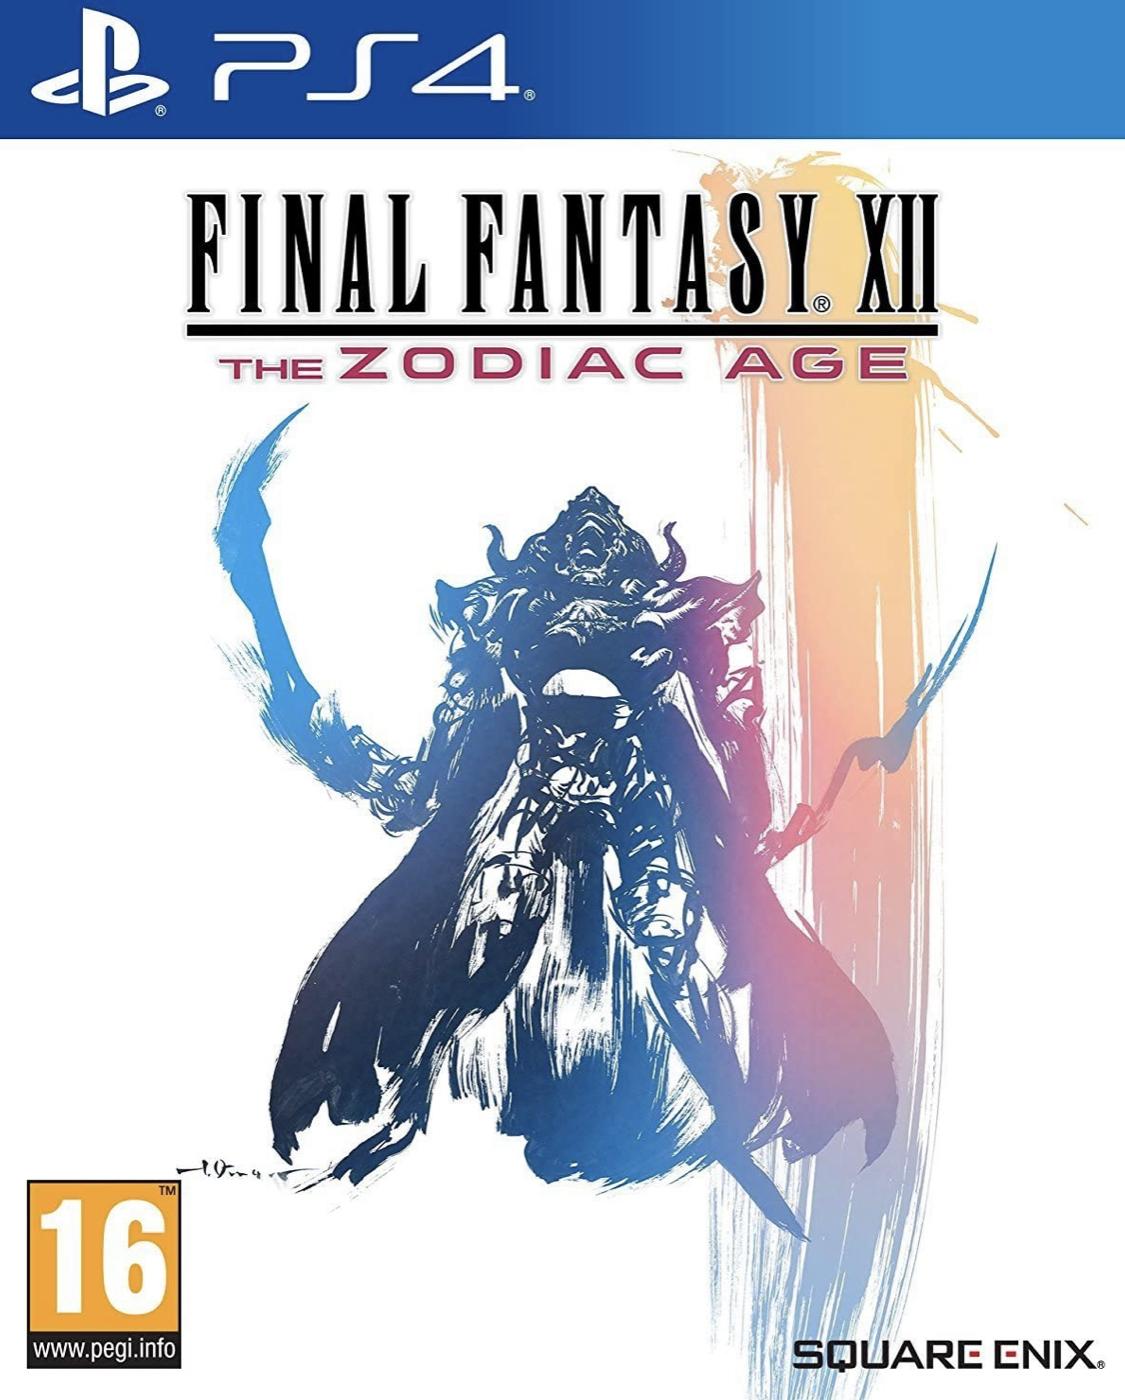 Final Fantasy XII: The Zodiac Age (PS4)